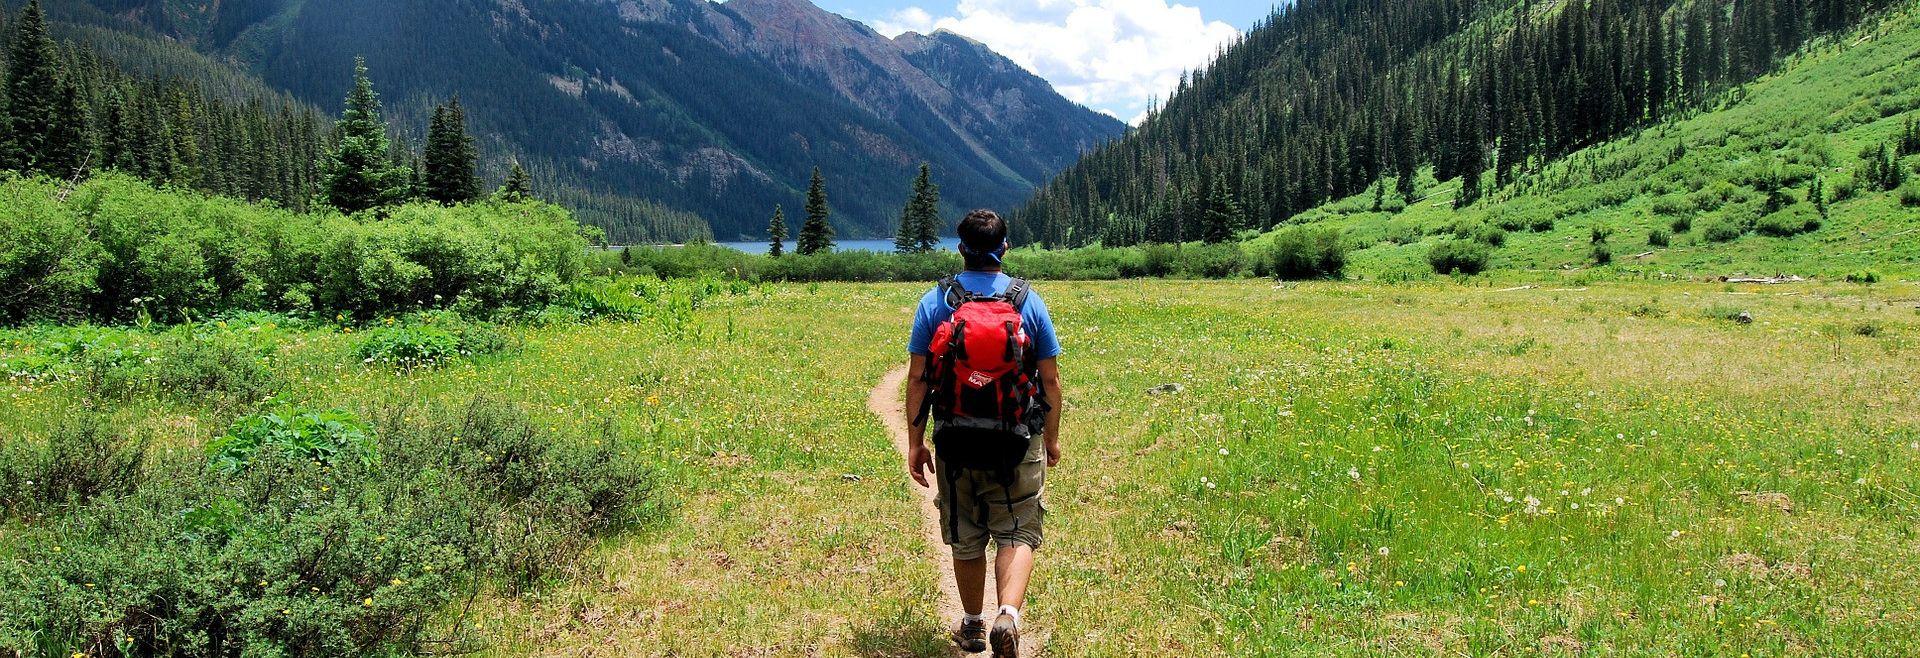 Last Minute Colorado Adventure Back Packing